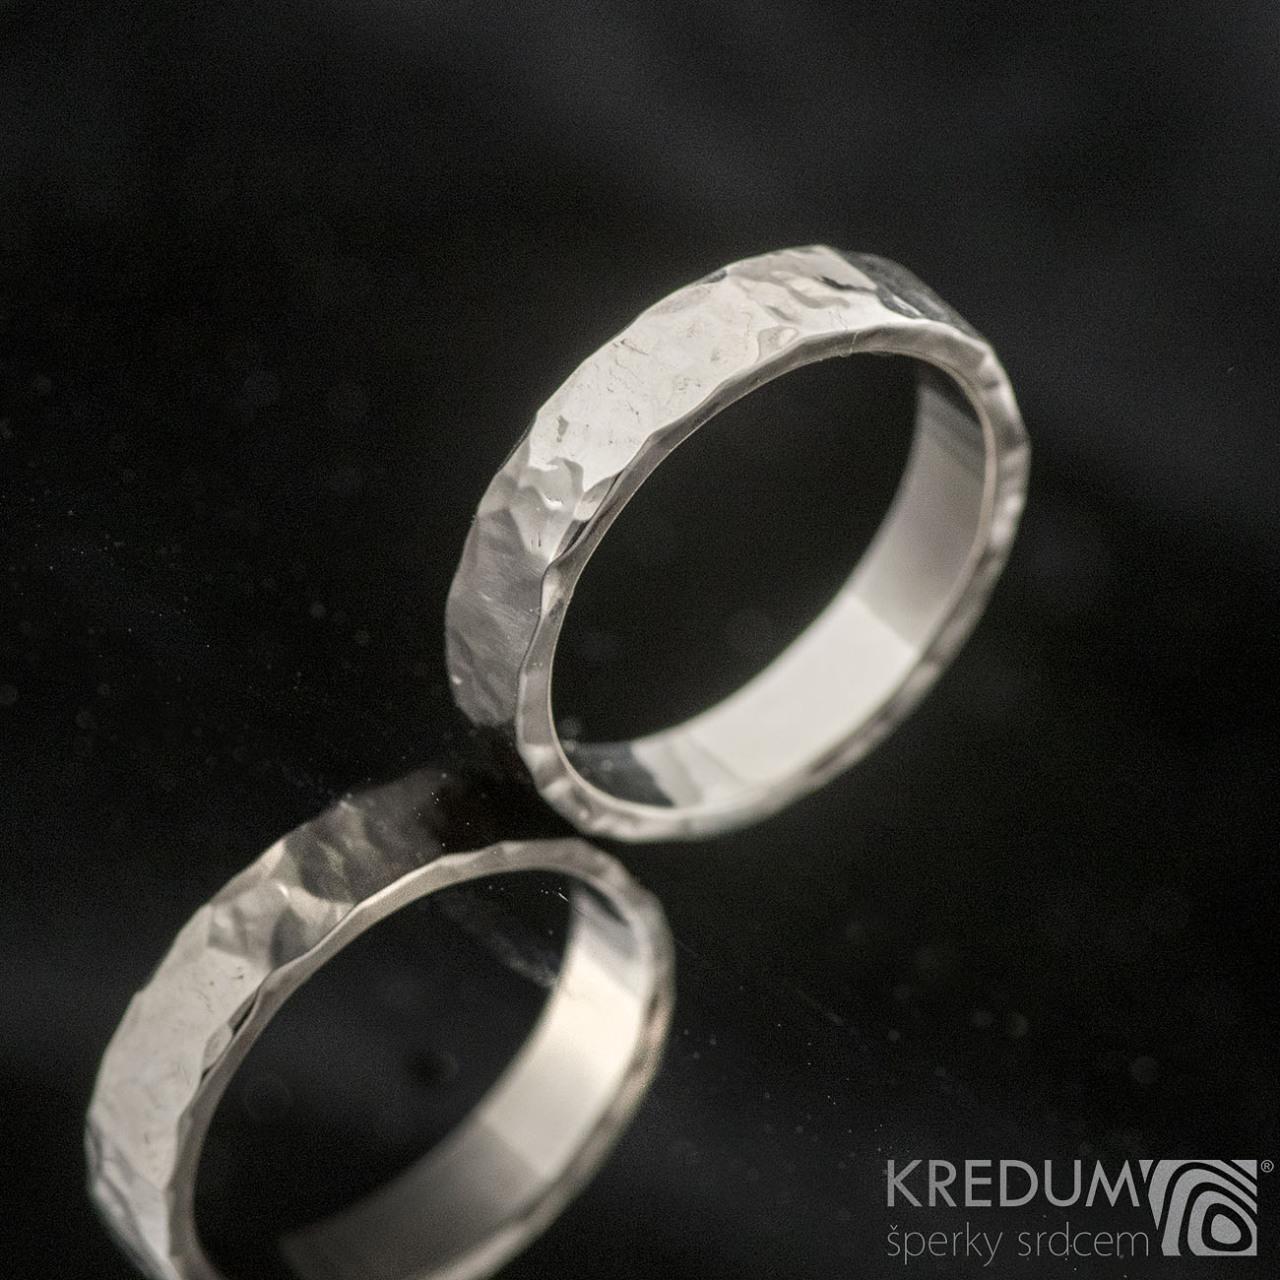 Golden Draill White Zlaty Snubni Prsten S2138 Vyroba Hand Made